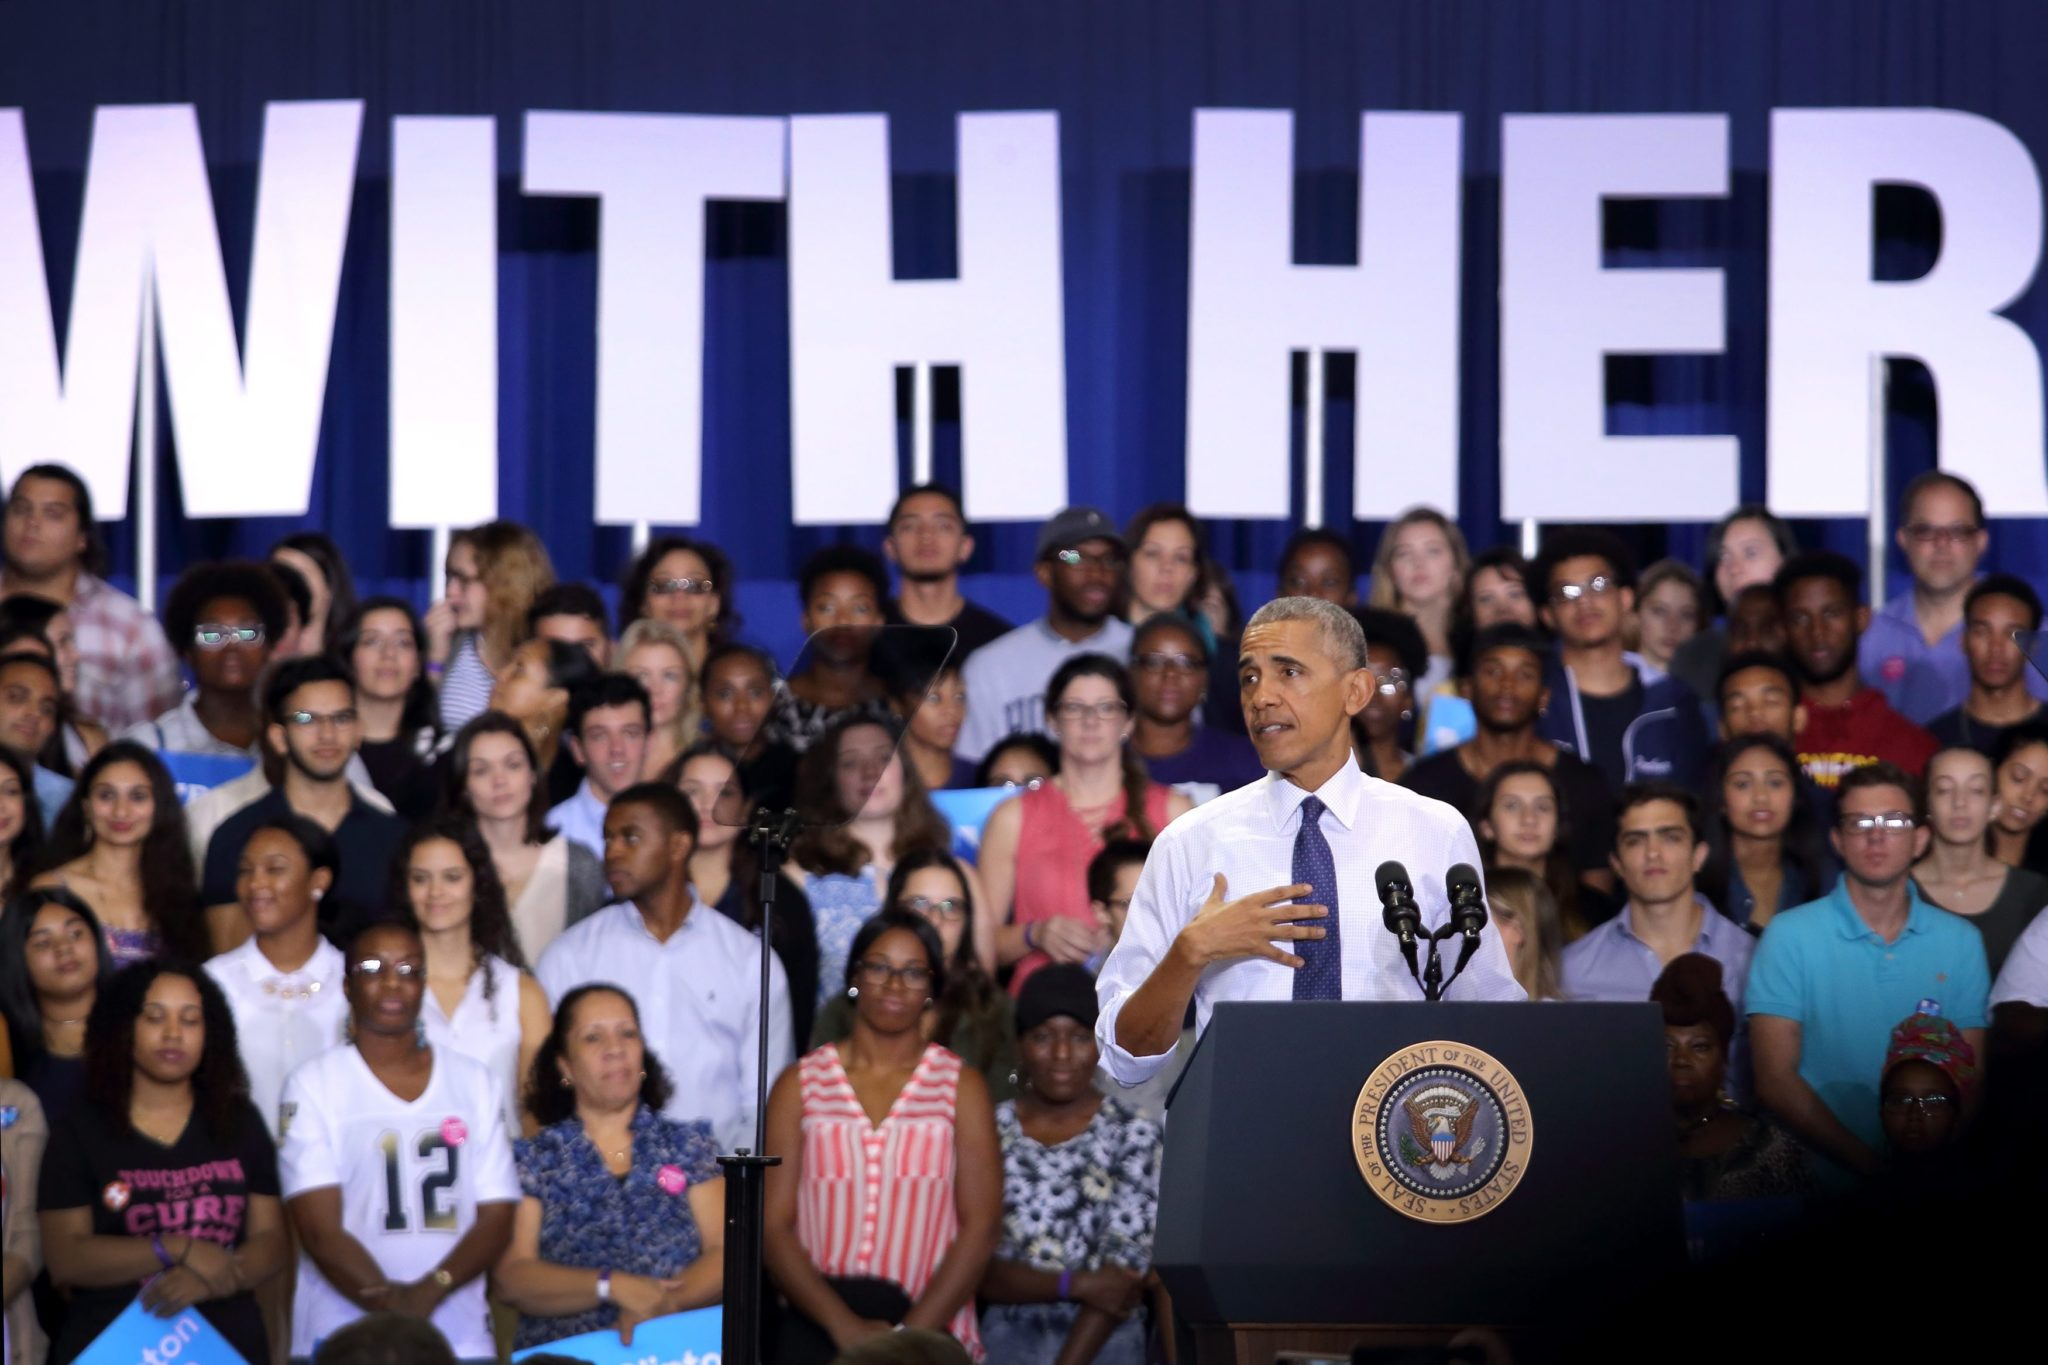 Prezydent Barack Obama podczas kampanii prezydenckiej Hillary Clinton na Florydzie. Fot. EPA/CRISTOBAL HERRERA